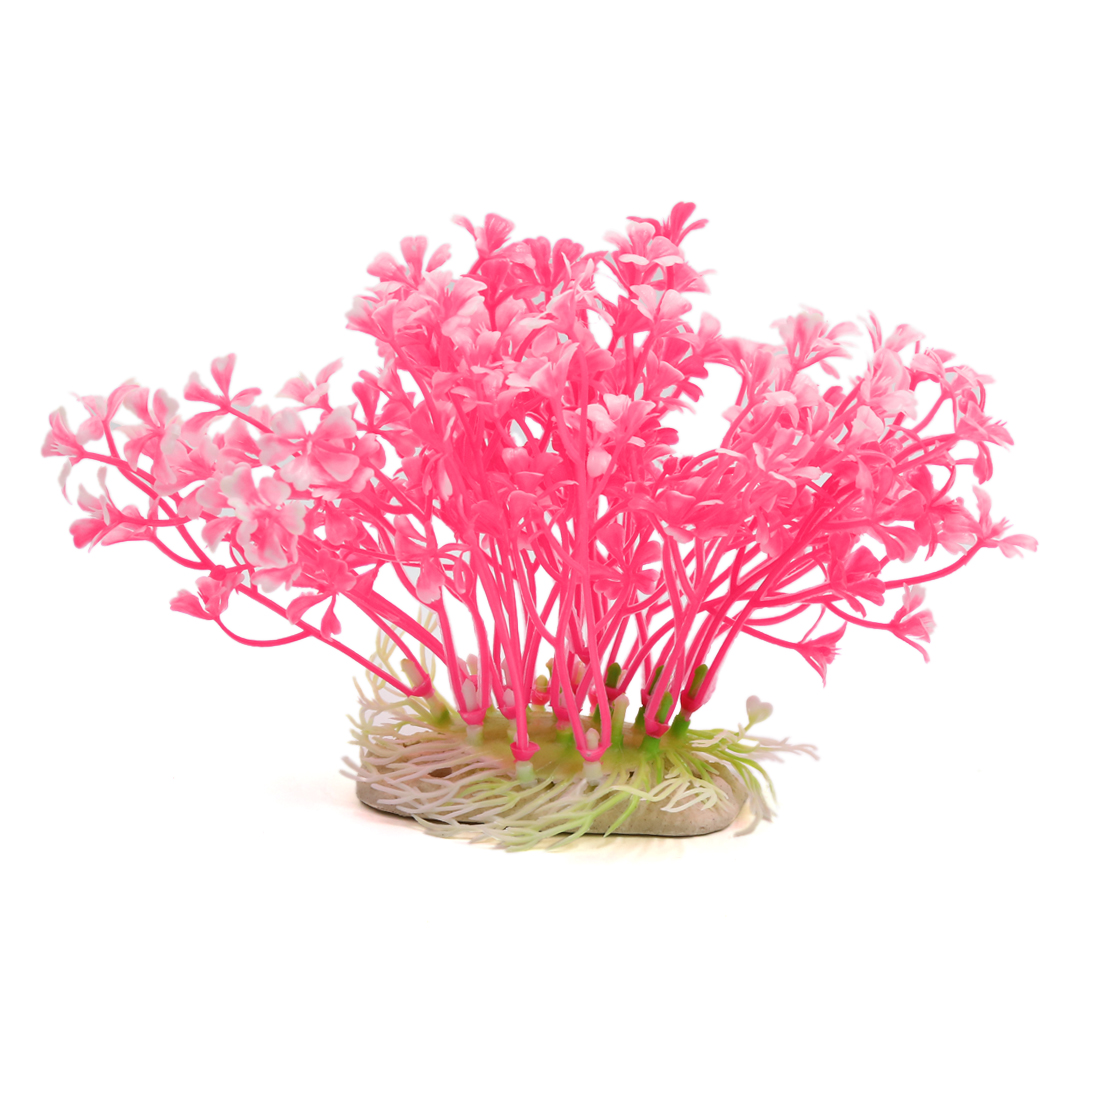 Pink Plastic Plant Aquarium Fish Tank Decor Beautify Landscape w/ Ceramic Base